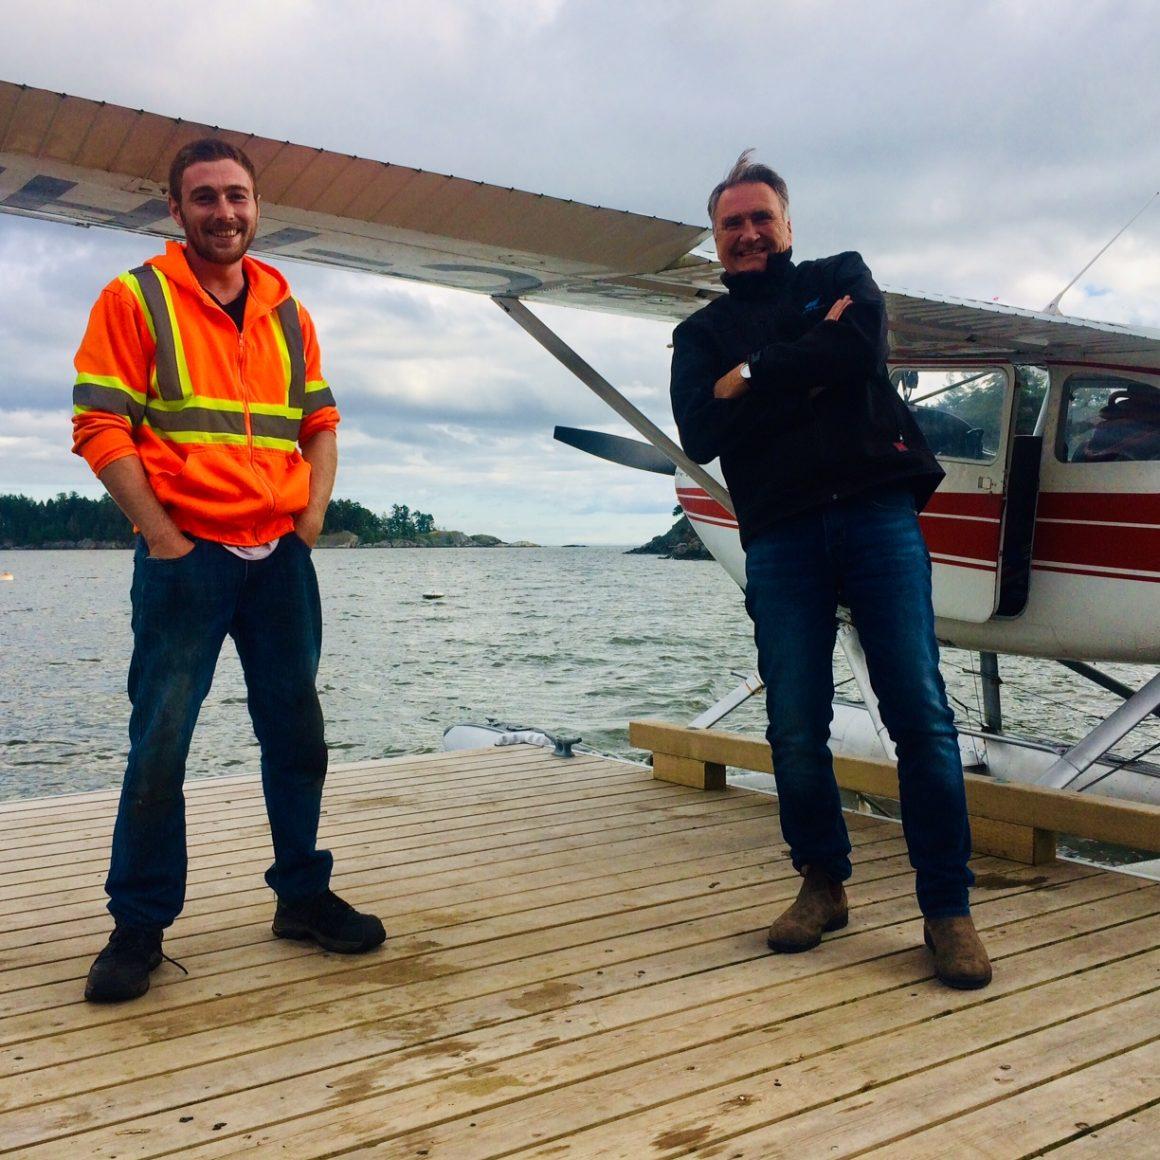 Kaman flying with Randy to Pasley Island